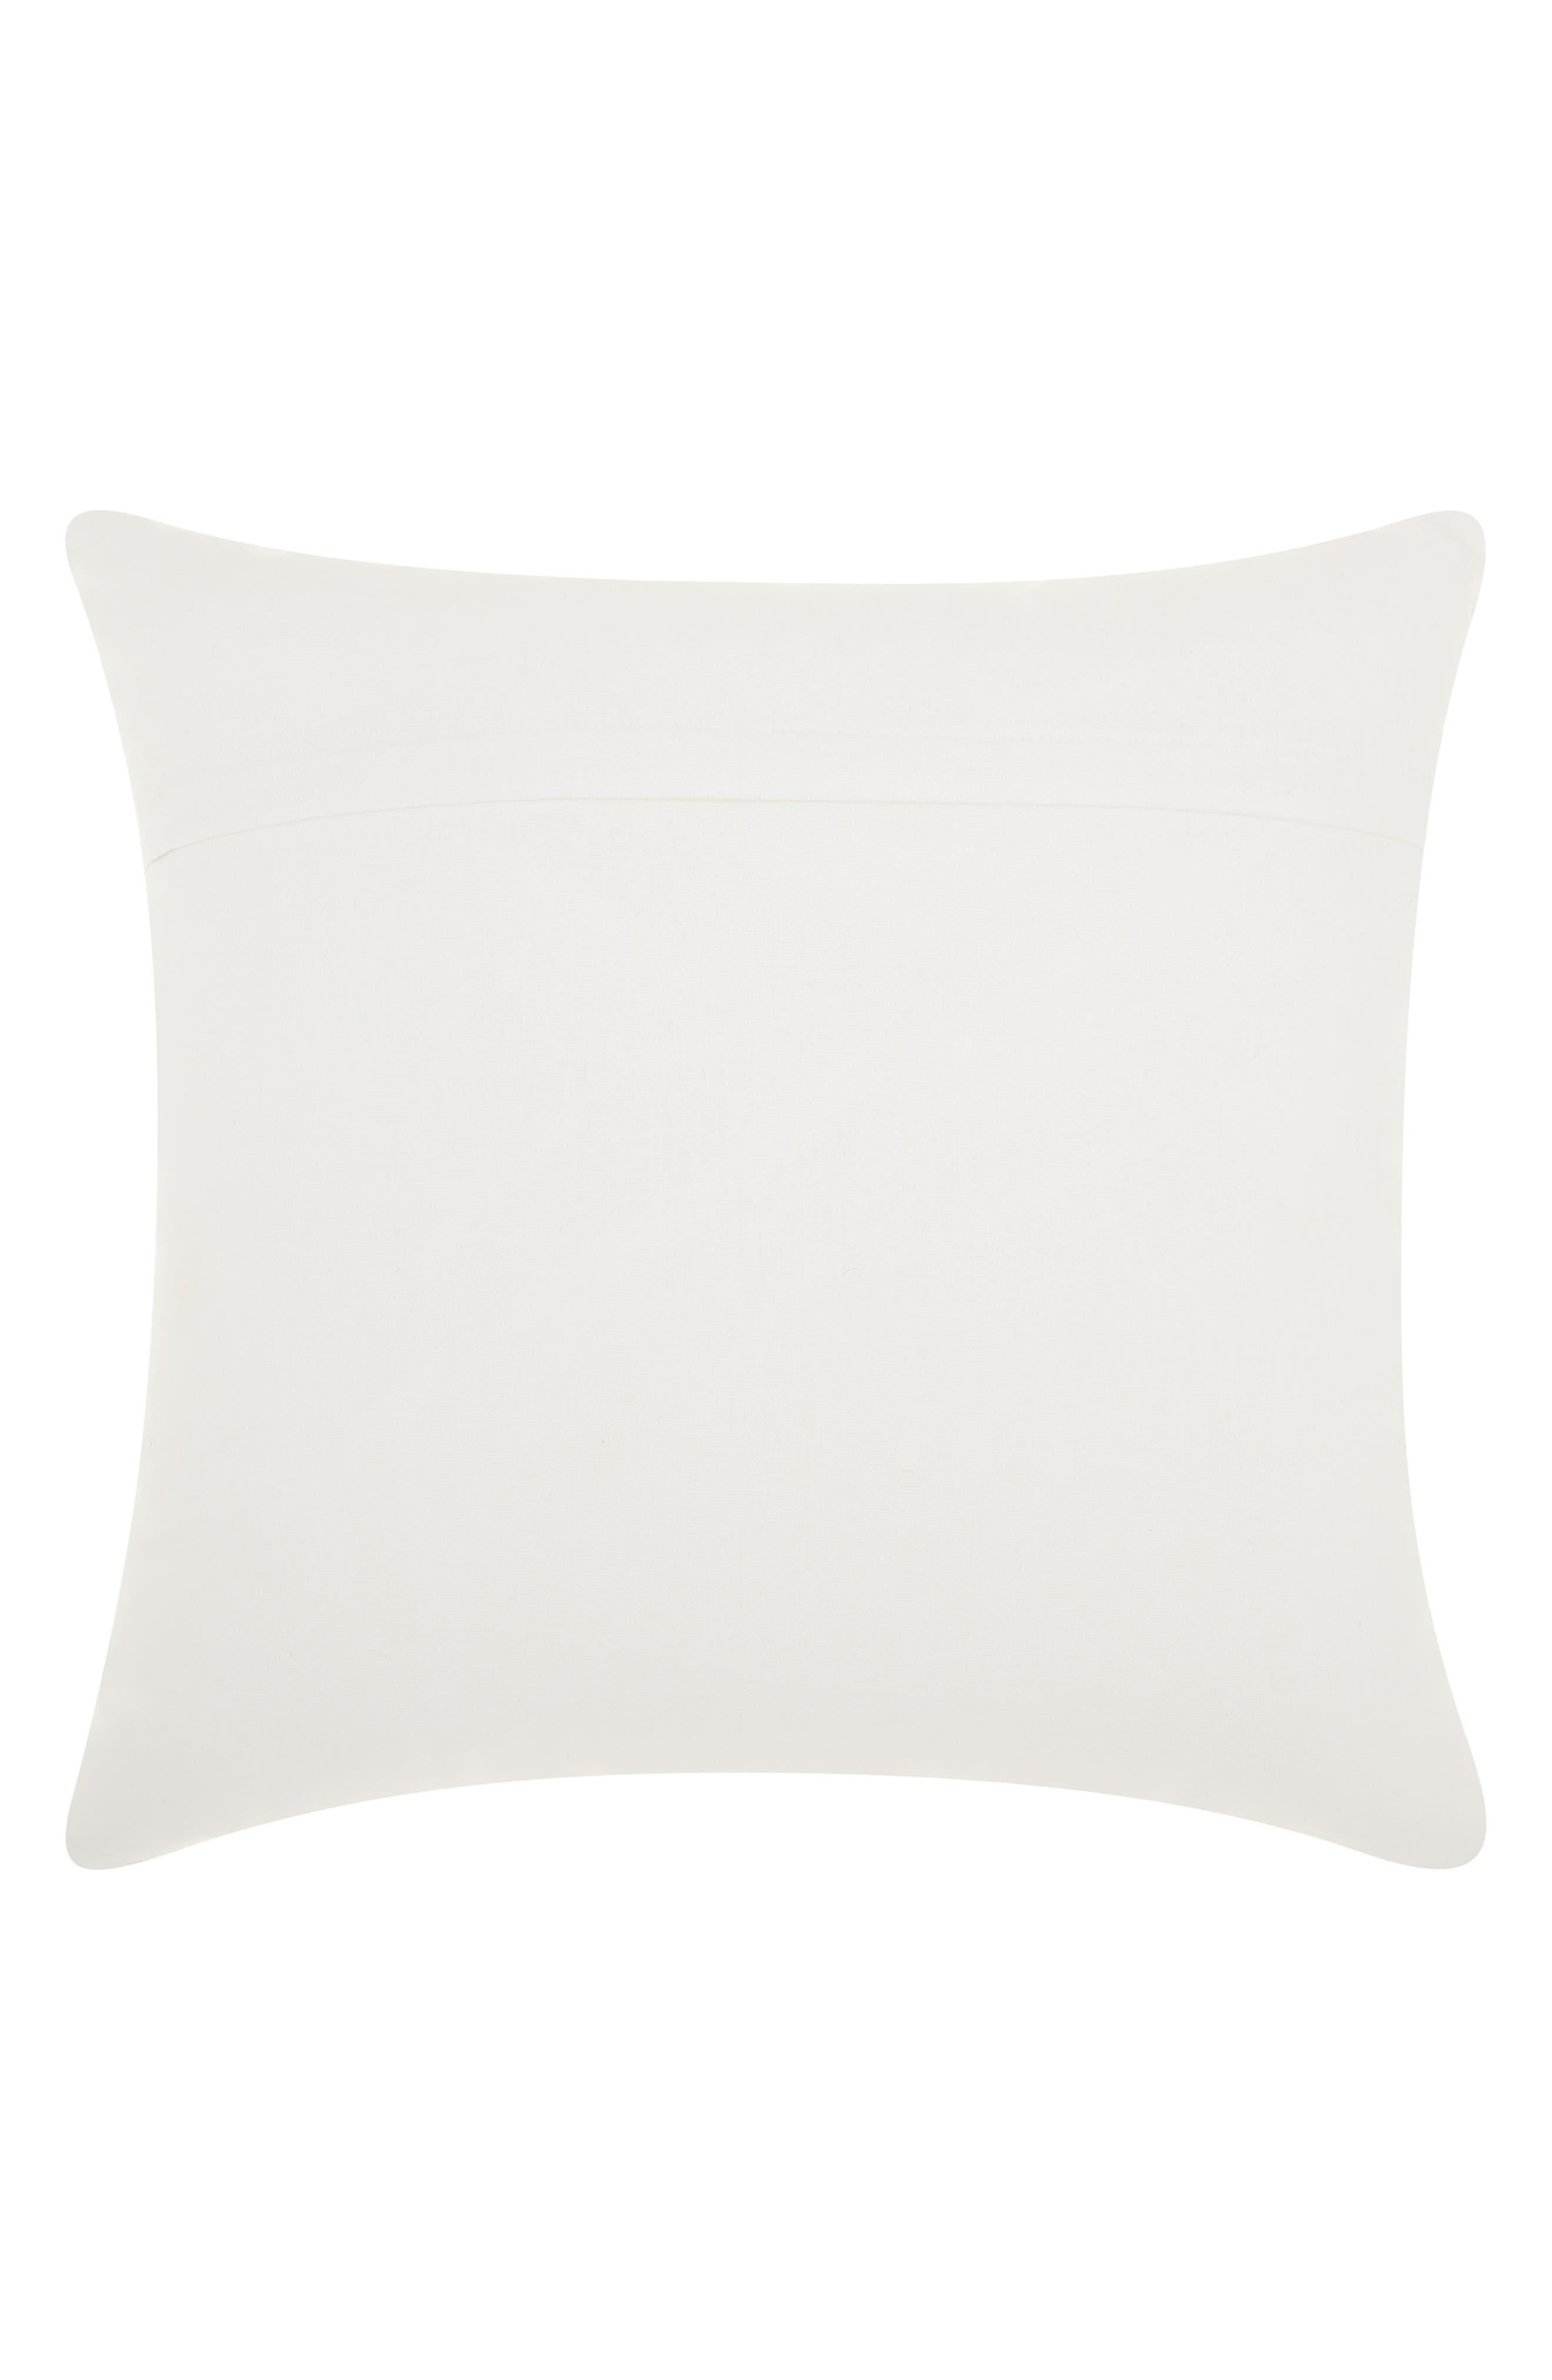 Sequin DJ Kitten Accent Pillow,                             Alternate thumbnail 2, color,                             WHITE